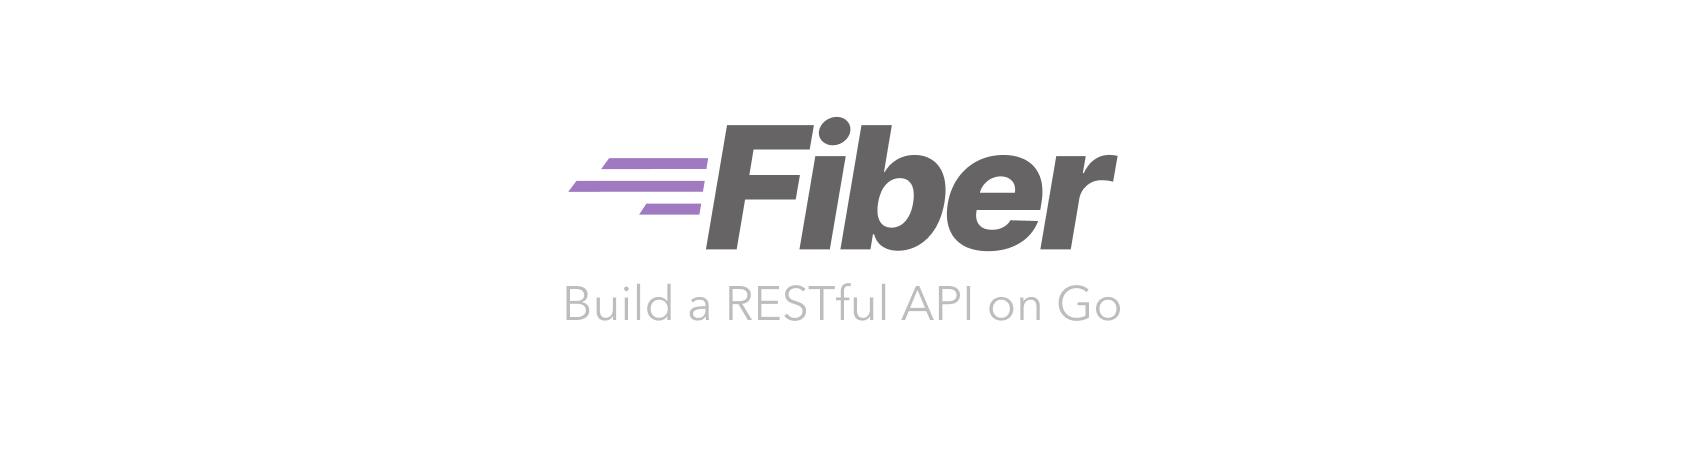 fiber_cover_gh